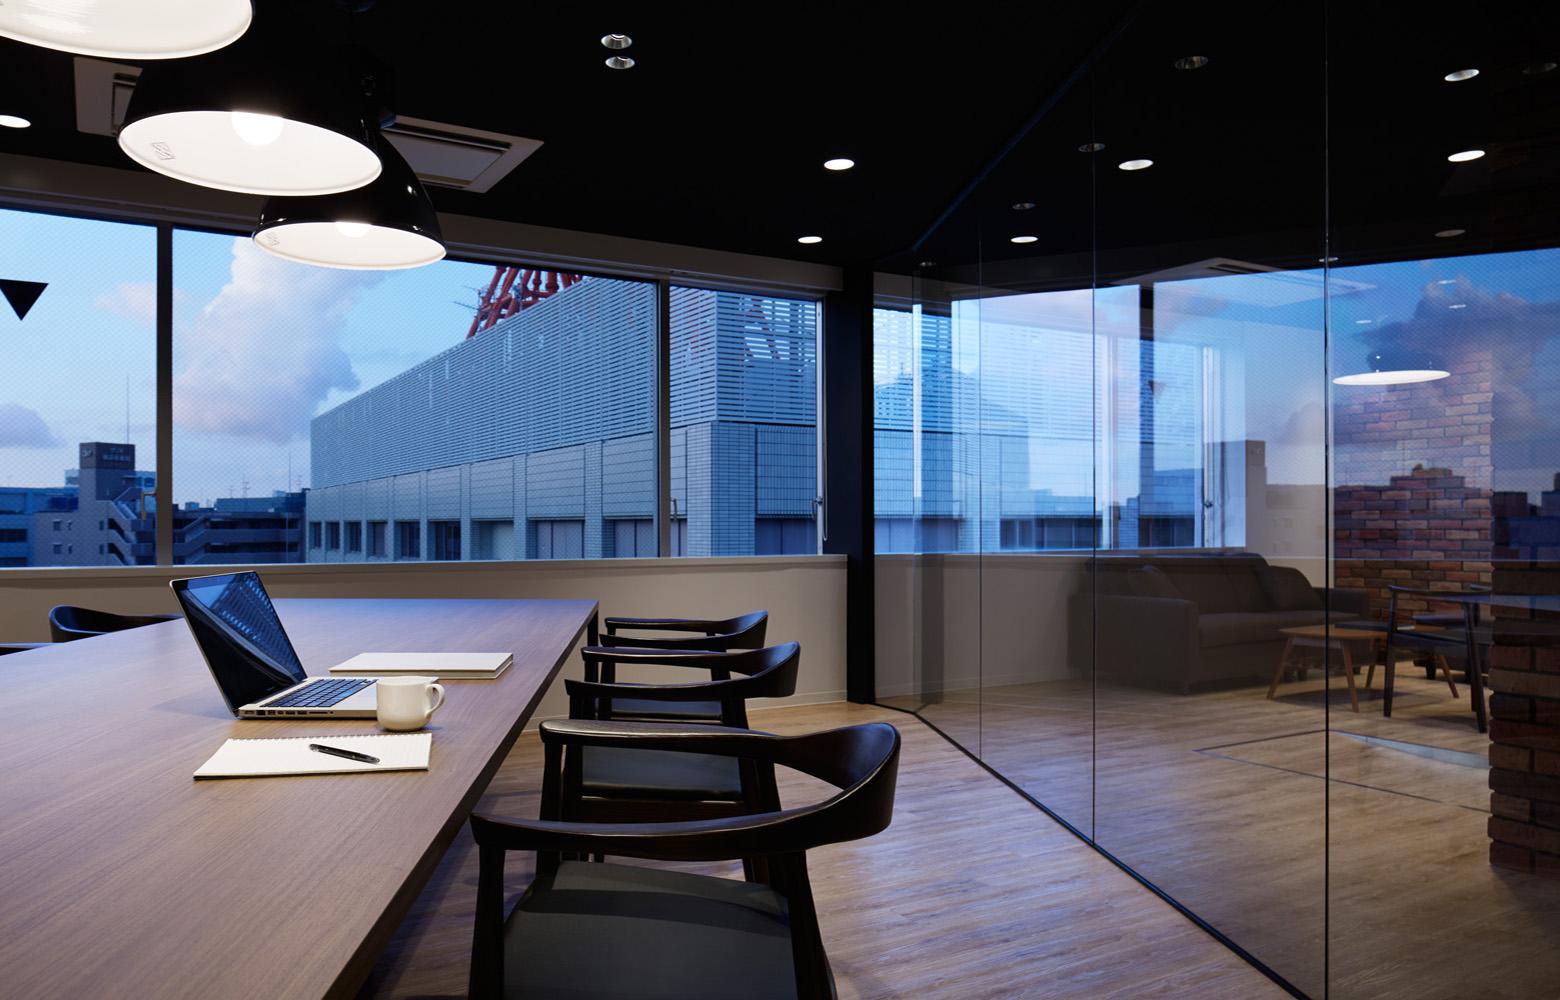 BEST株式会社 Meeting Space_2 デザイン・レイアウト事例